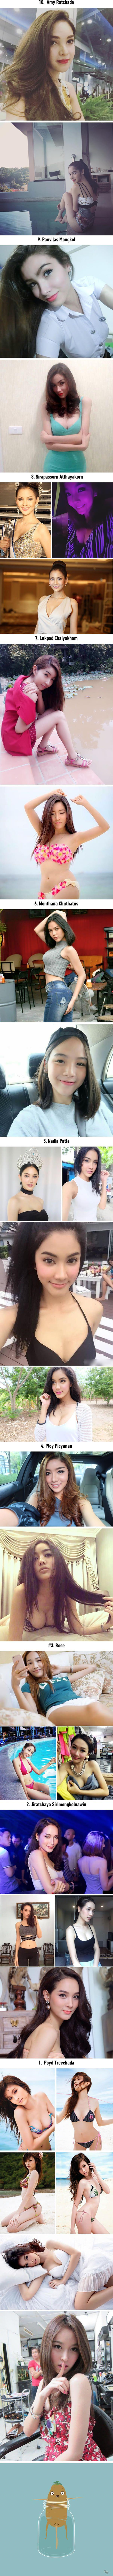 Top 10 Most Beautiful Transgender Girls In Thailand